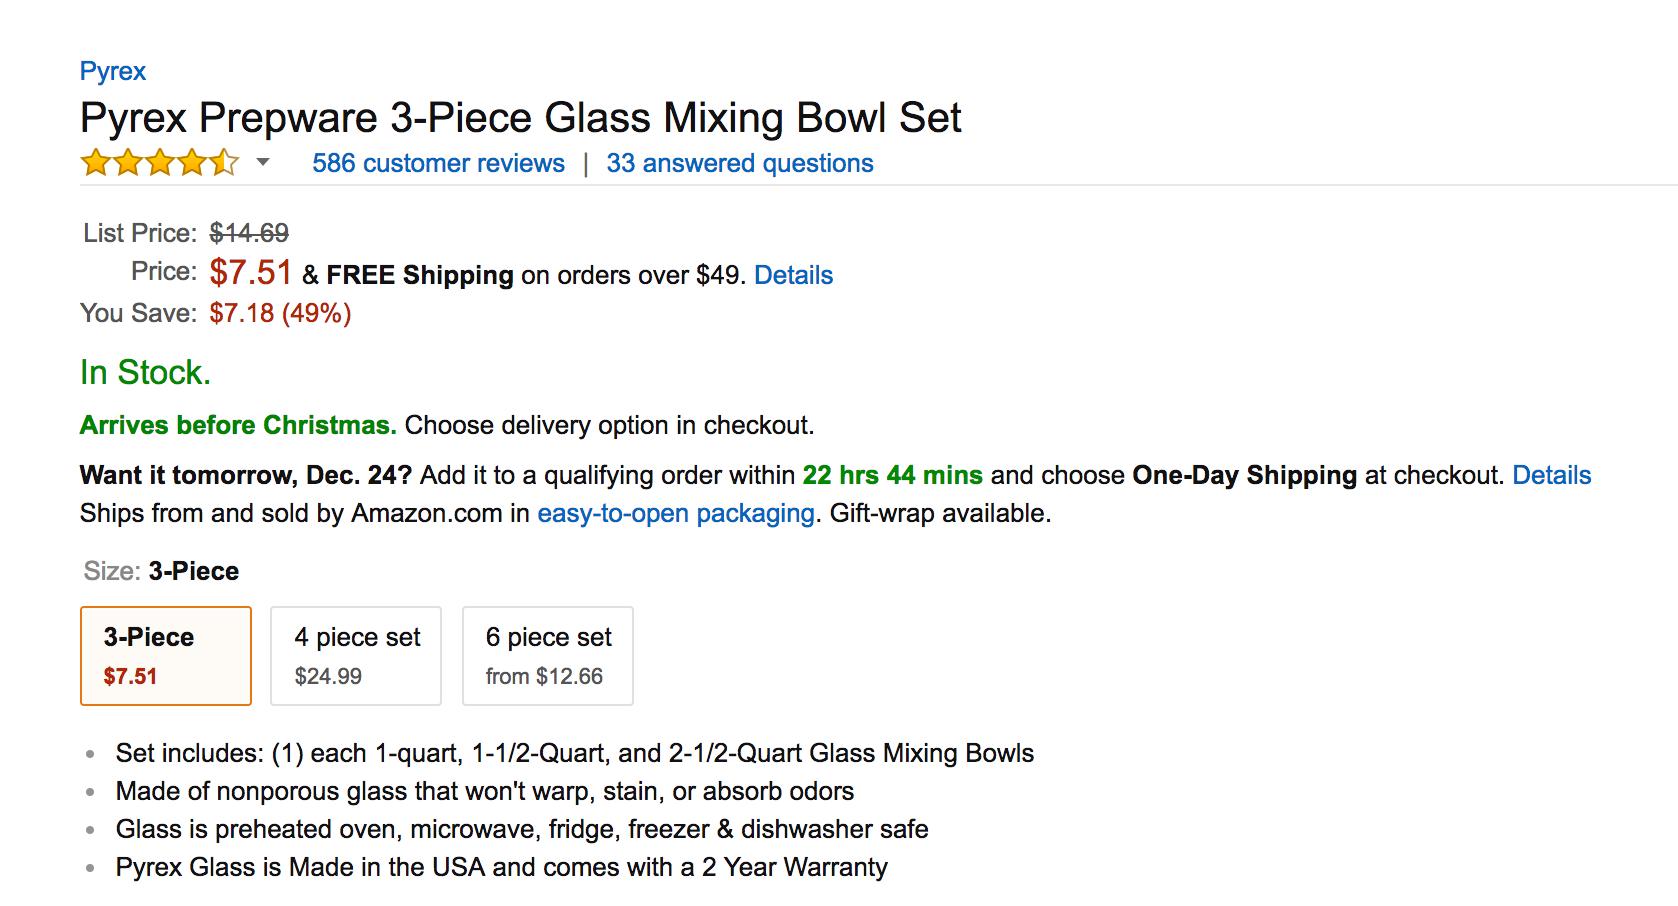 pyrex-prepware-3-piece-glass-mixing-bowl-set-5